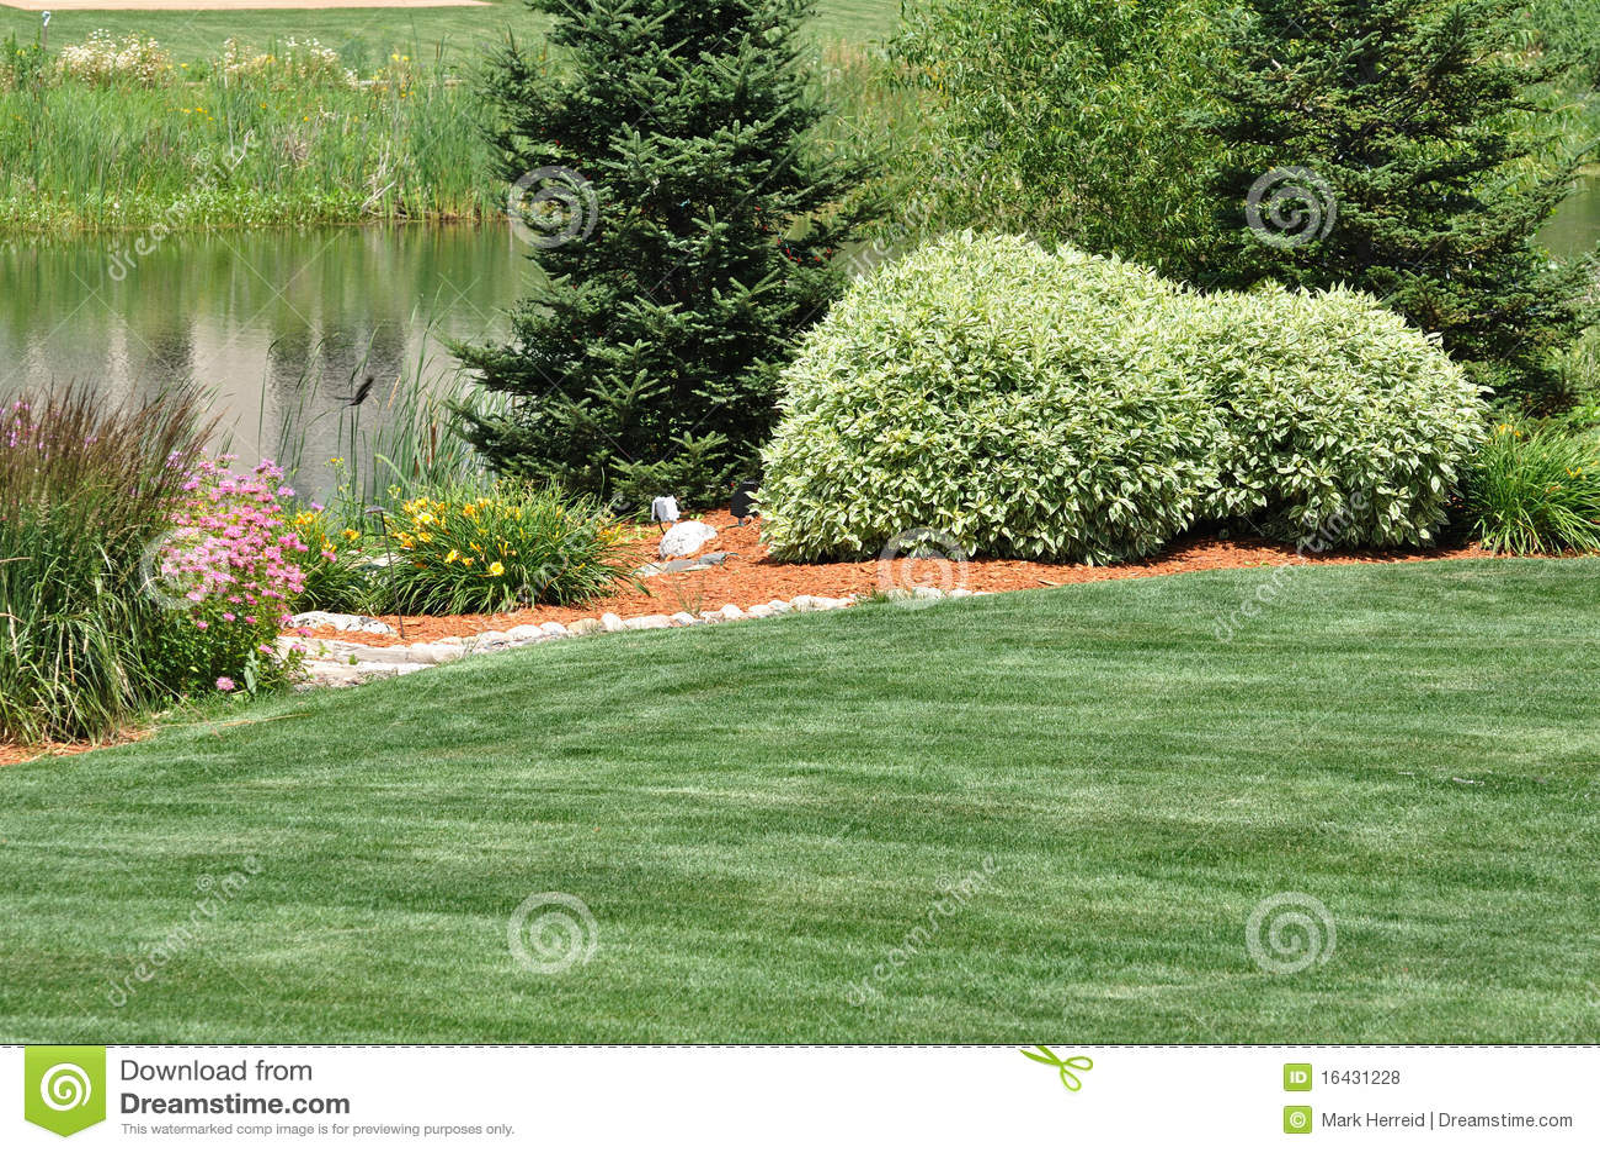 Backyard landscaping royalty free stock photos image for Sample garden landscape